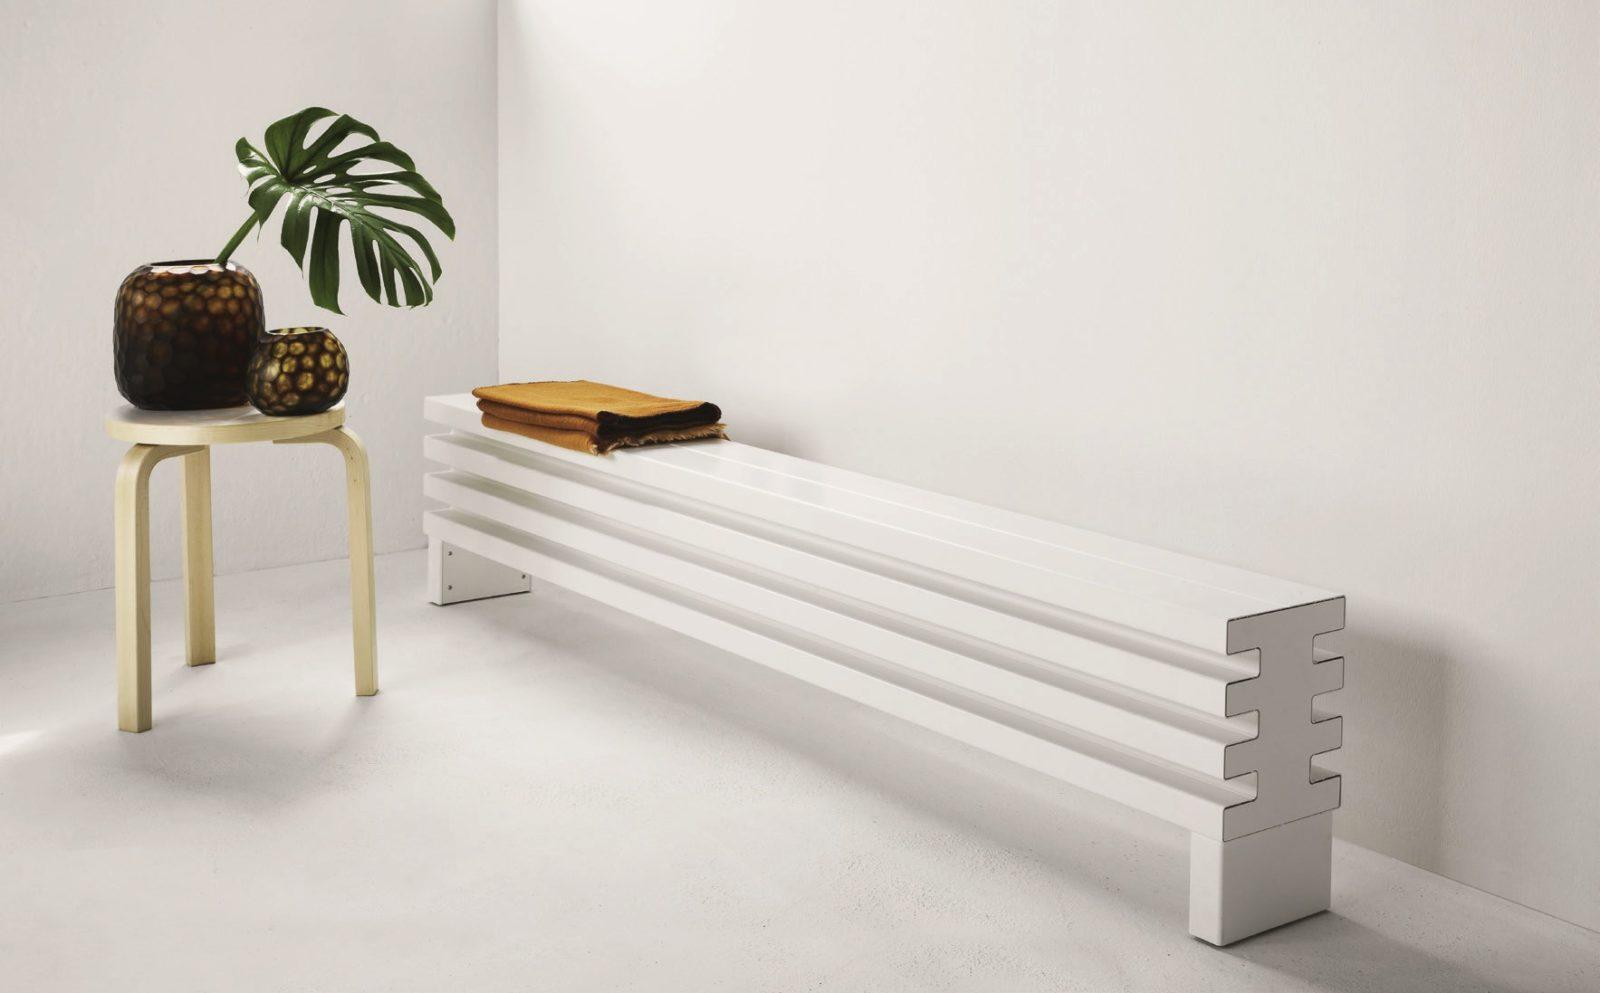 soho-horizontal-radiator-tubes-radiatori-170679-rele5aeb278